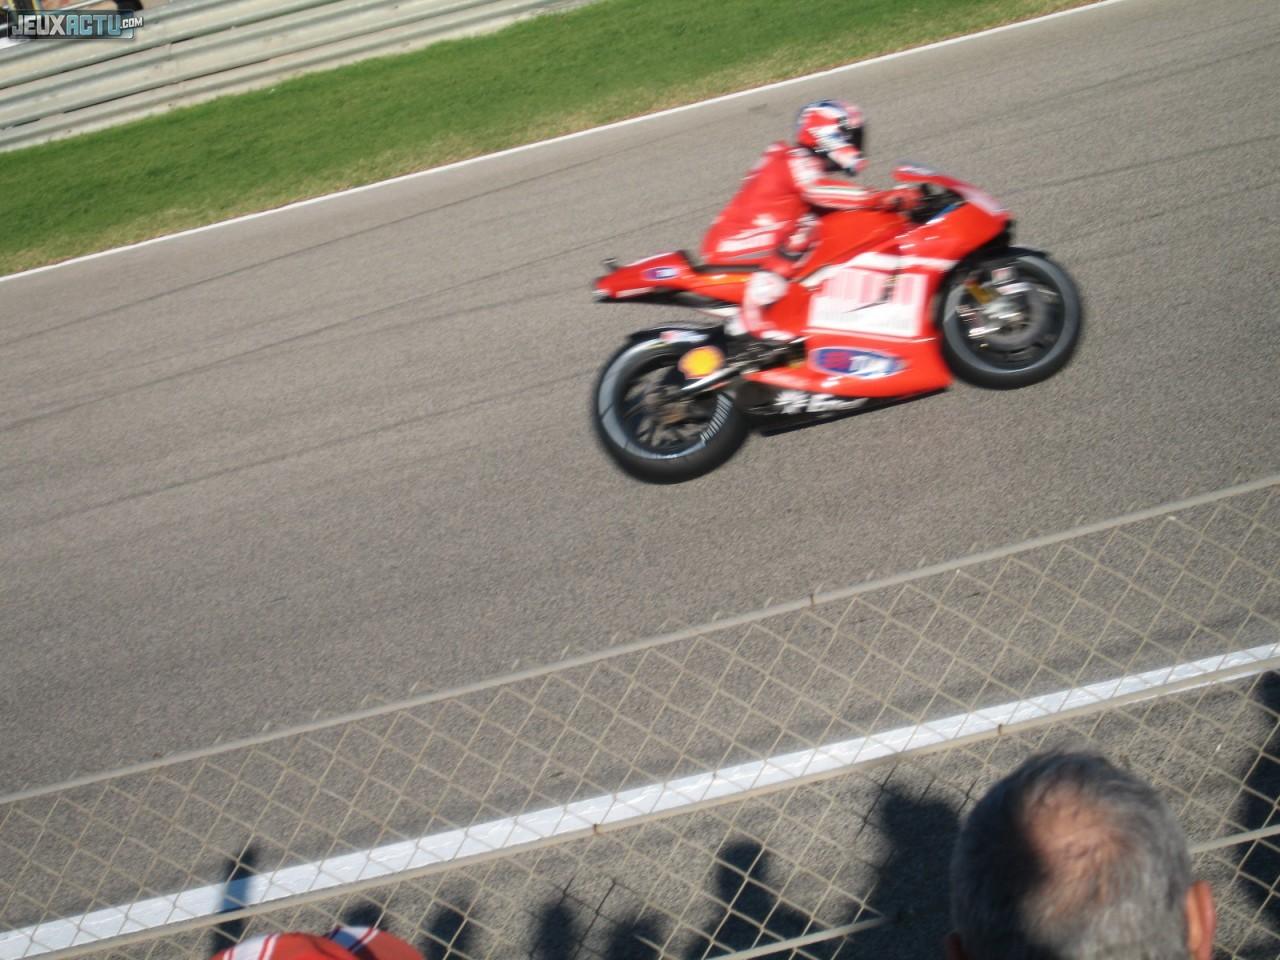 Motogp 2016 Pc Gameplay   MotoGP 2017 Info, Video, Points Table